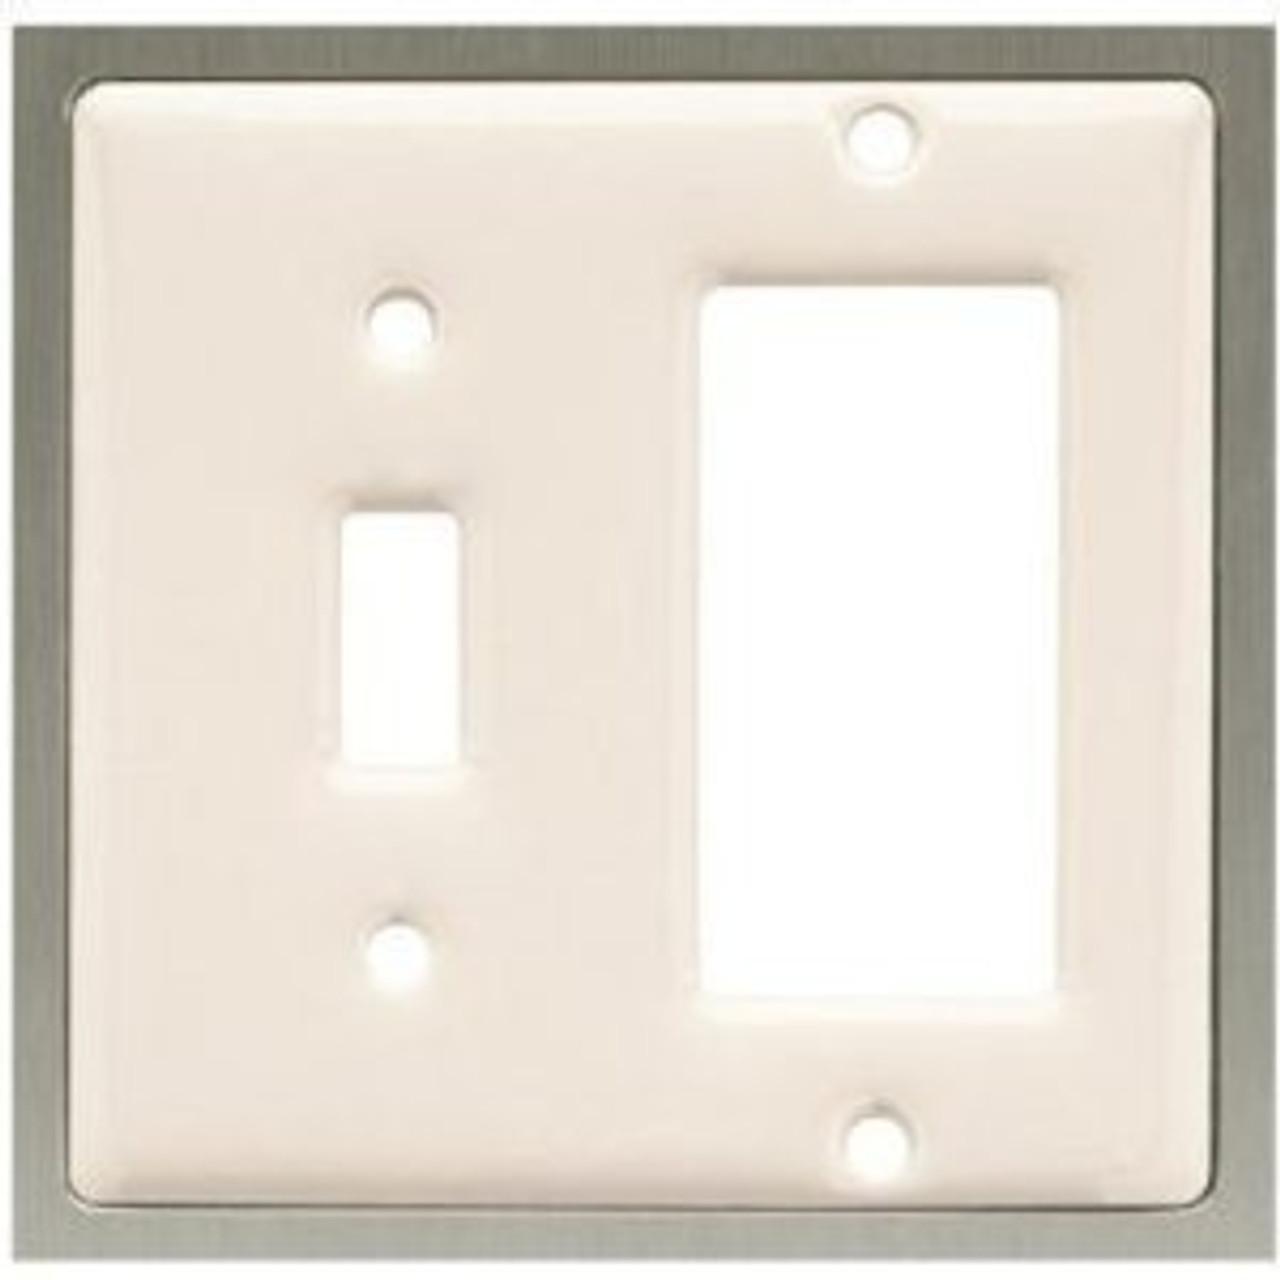 63985 Bisque Ceramic & Satin Nickel Single Switch Single GFCI Cover Plate